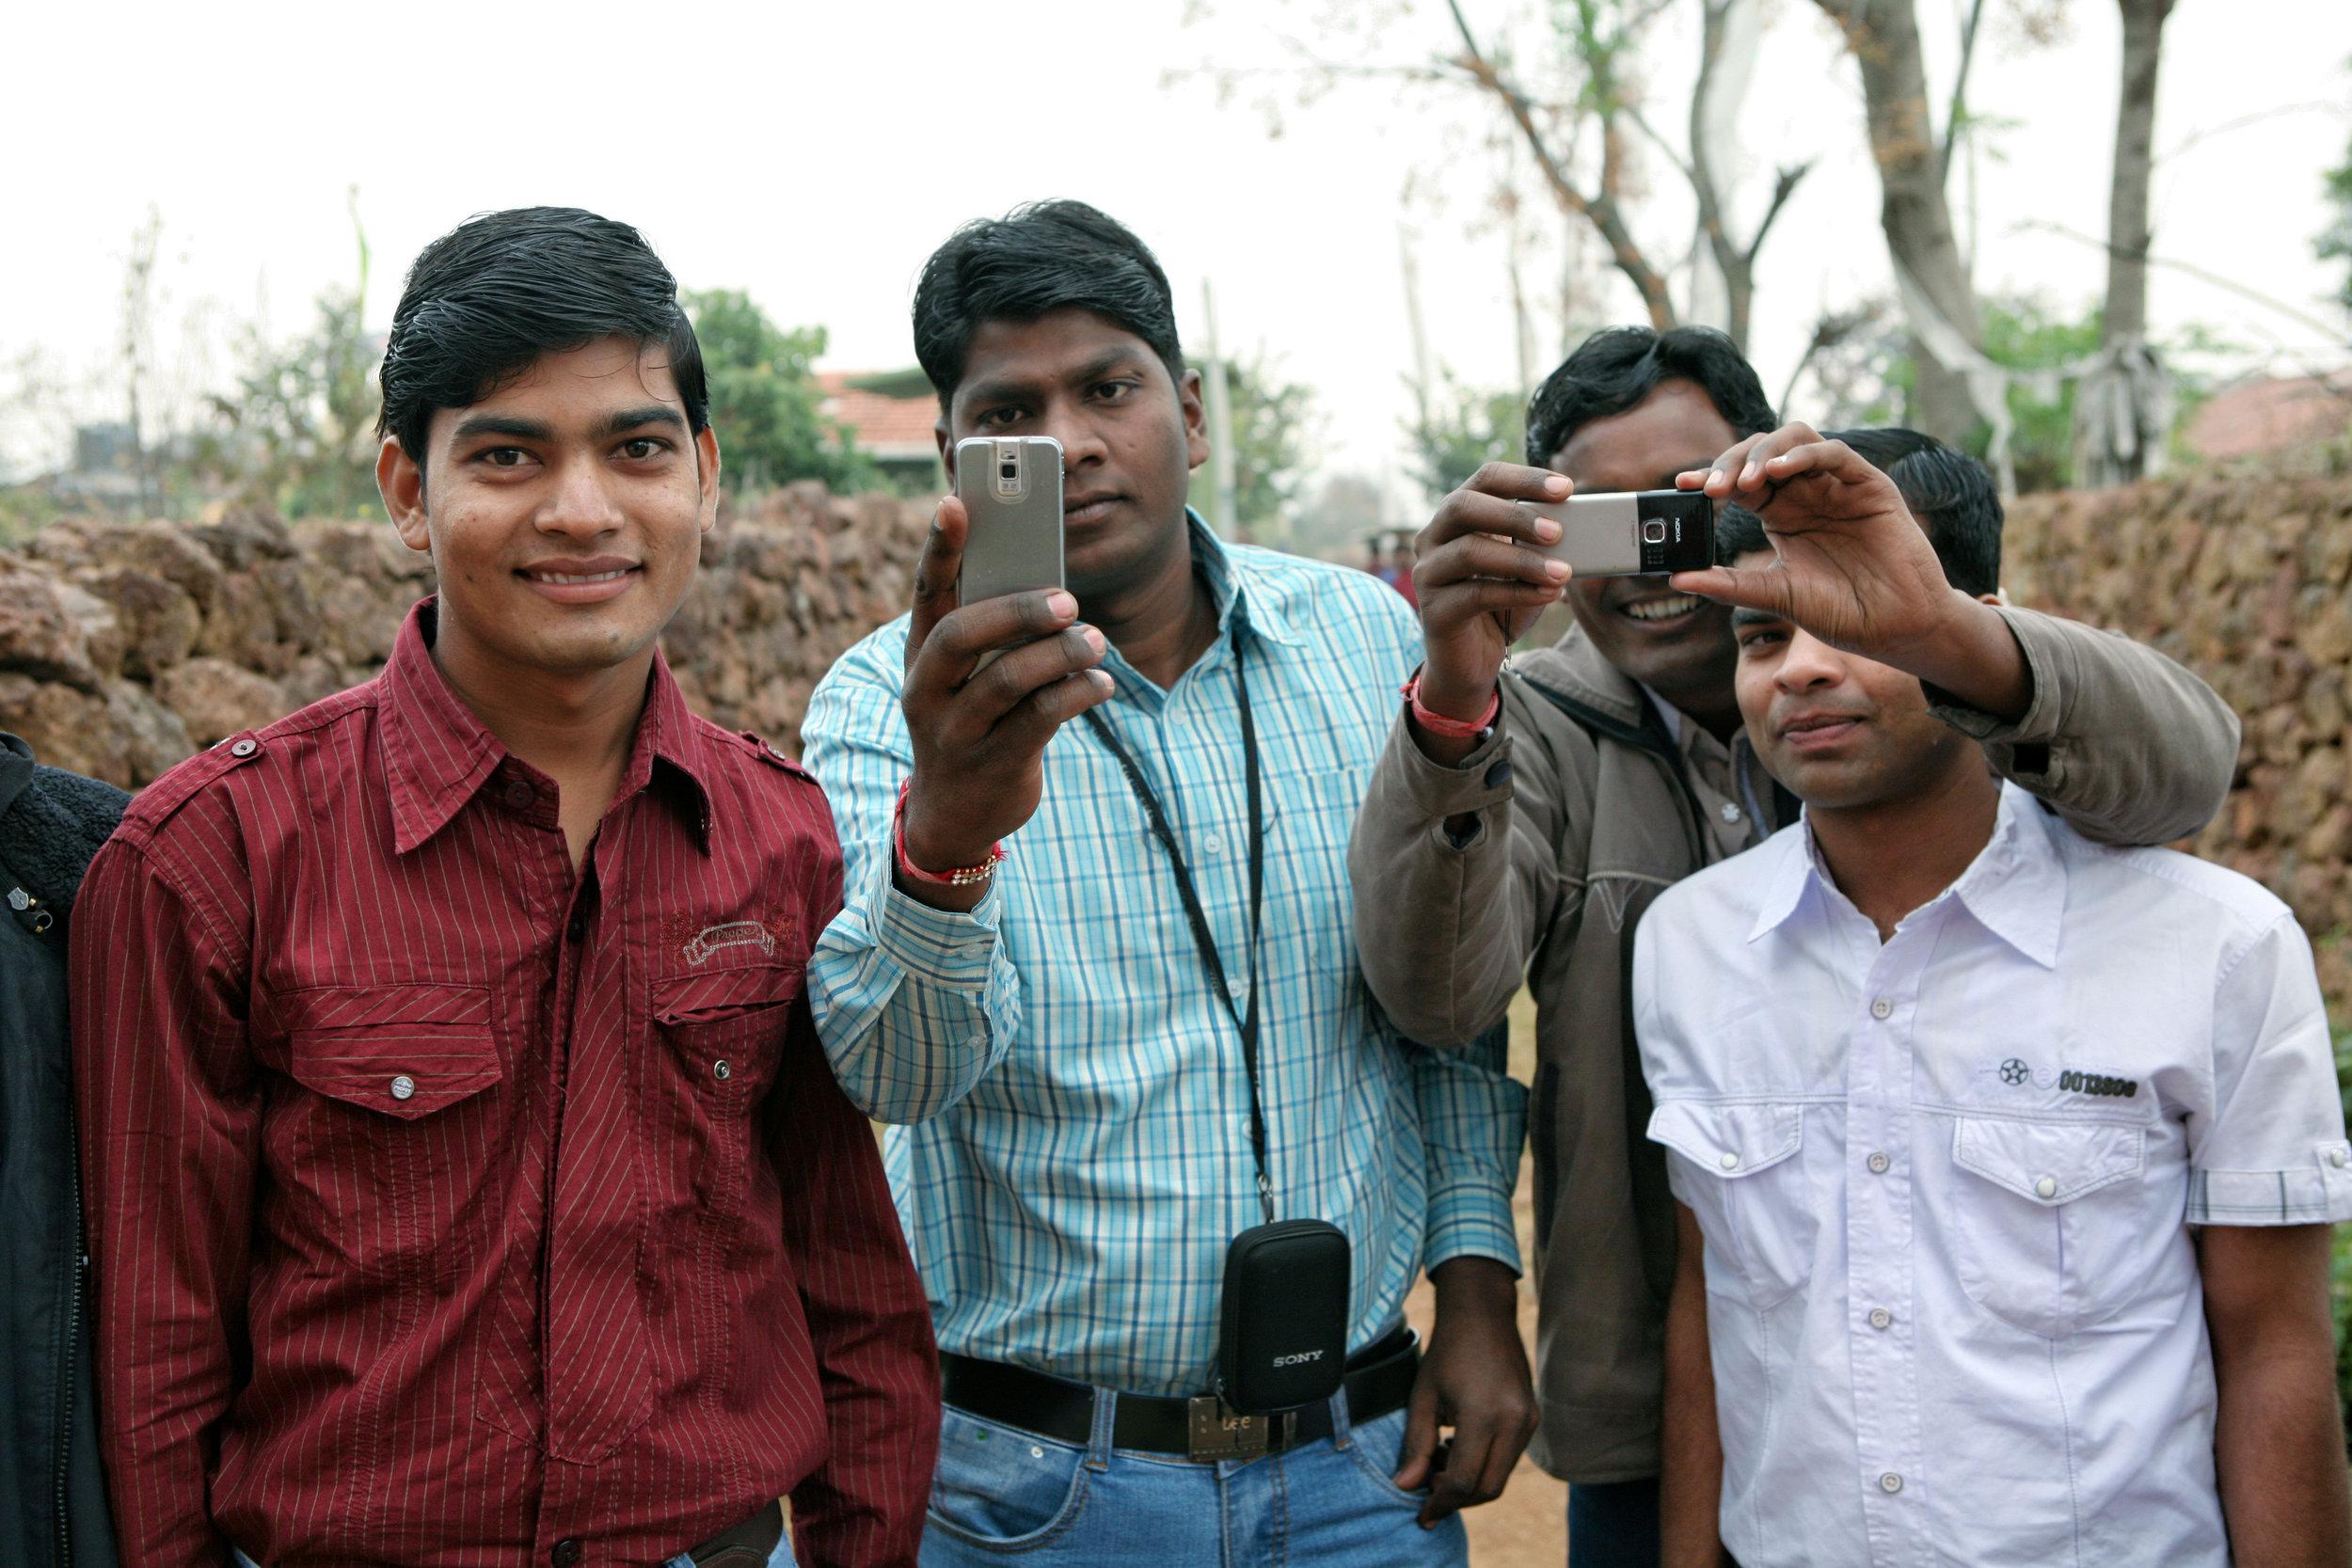 peoplephotographing08.jpg